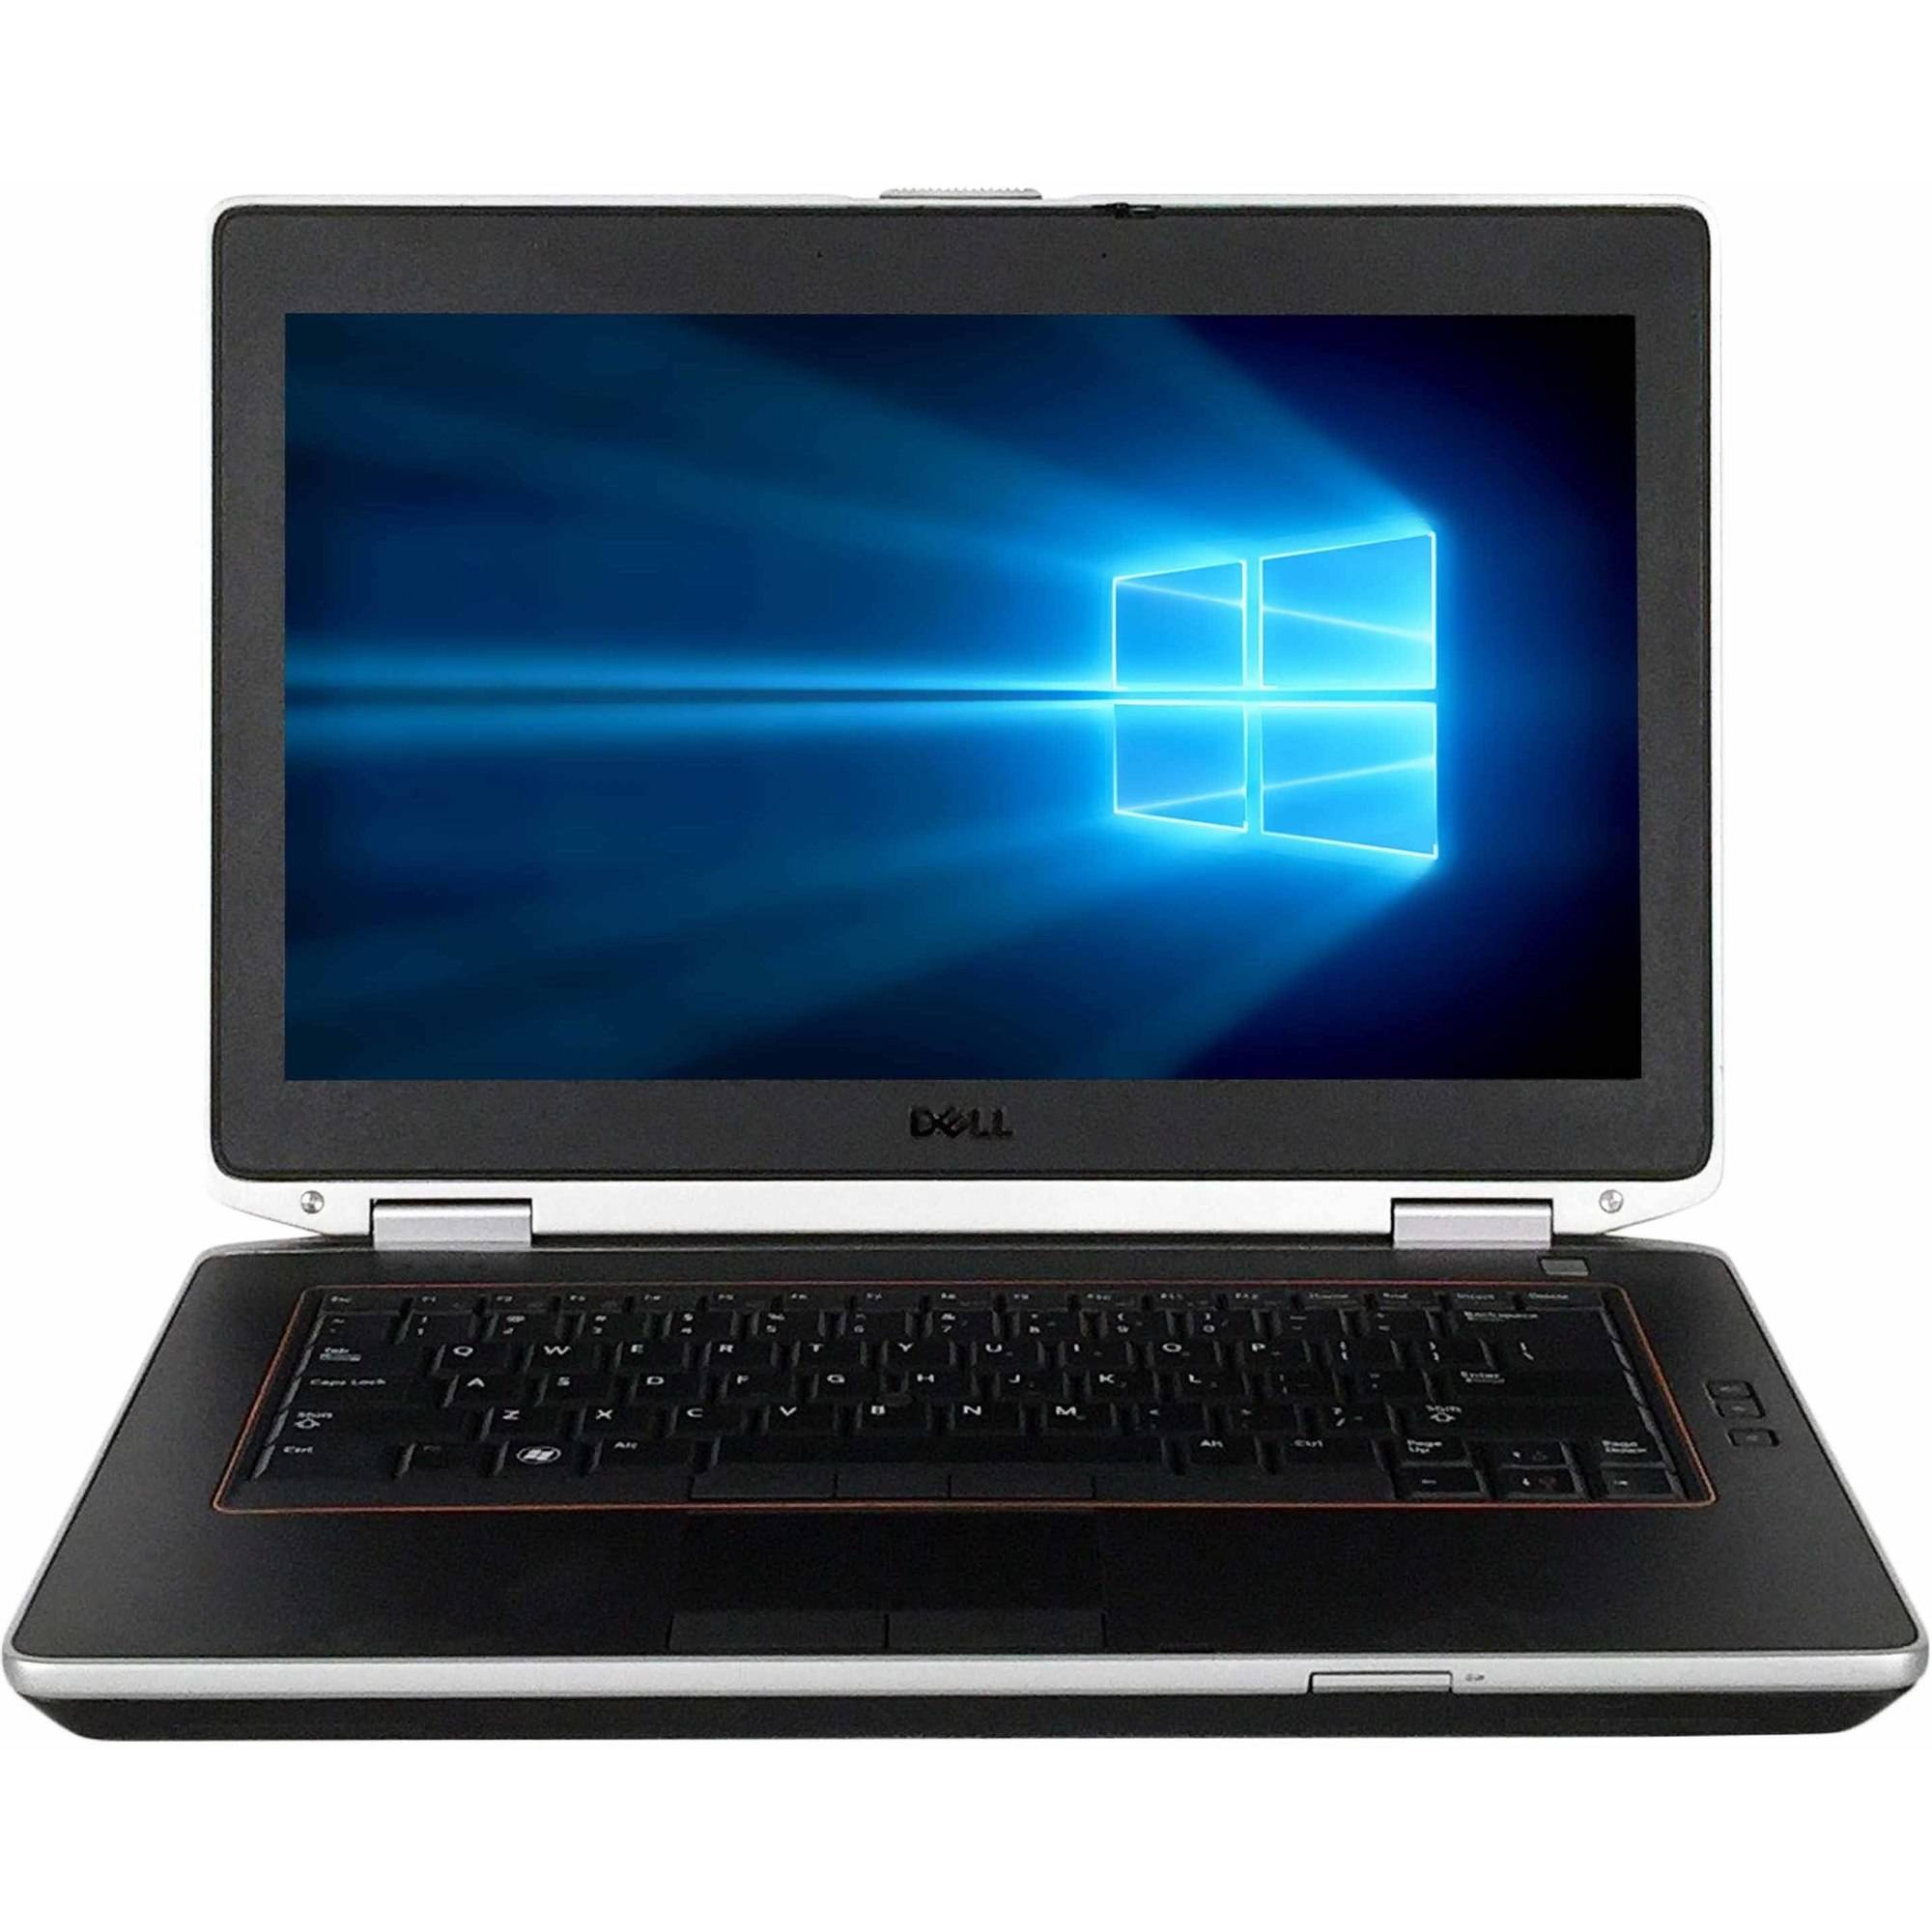 "Refurbished Dell E6420 14.0"" Laptop, Windows 10 Pro, Intel Core i5-2520M Processor, 8GB RAM, 1TB Hard Drive"